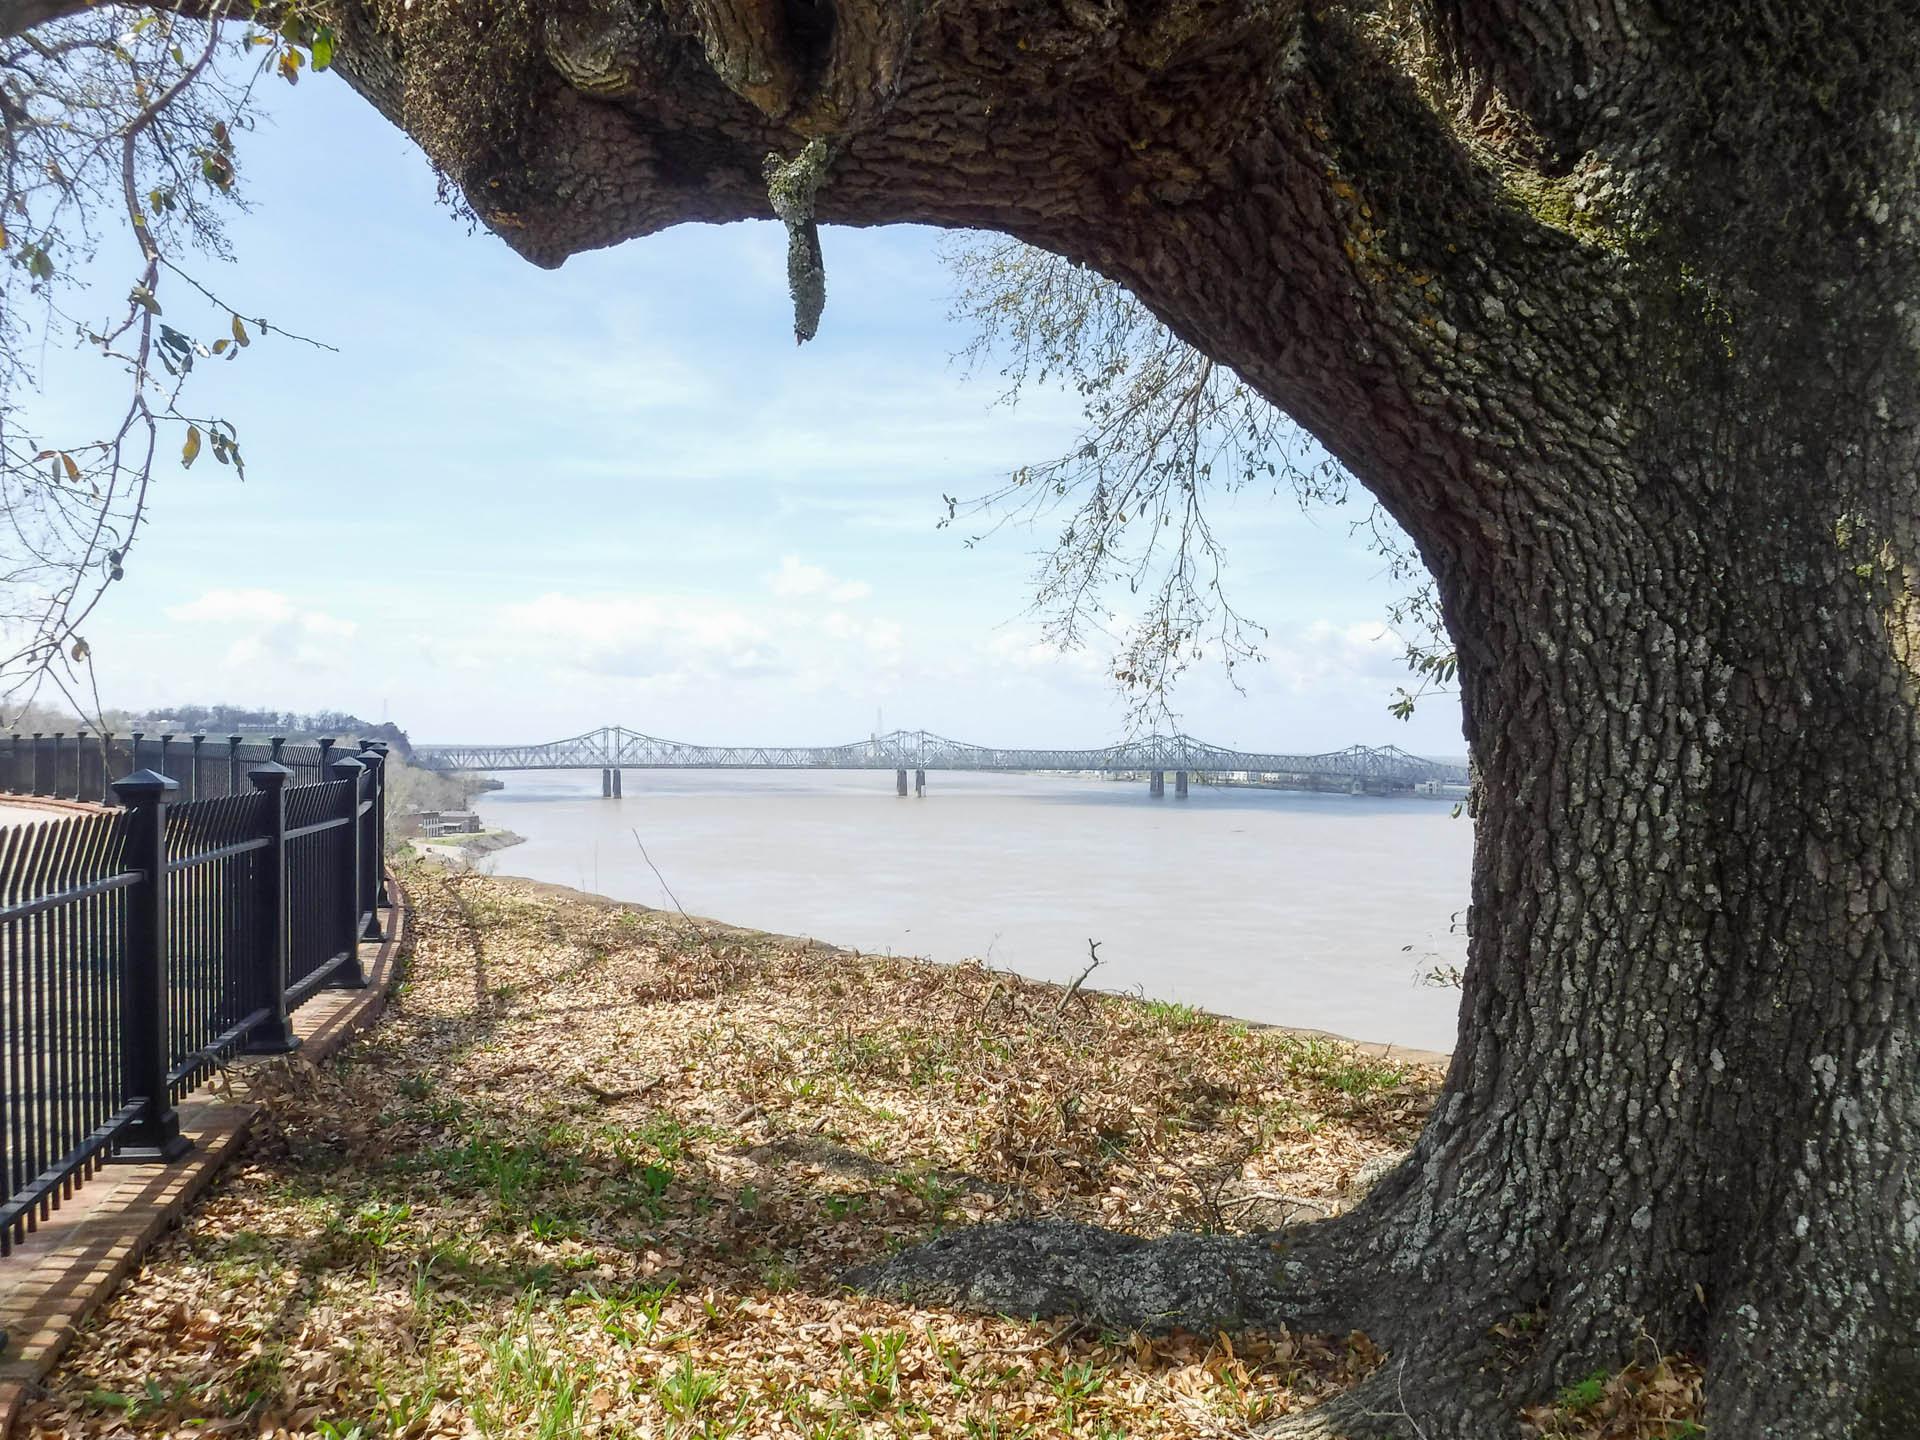 Mississippi River with bridge